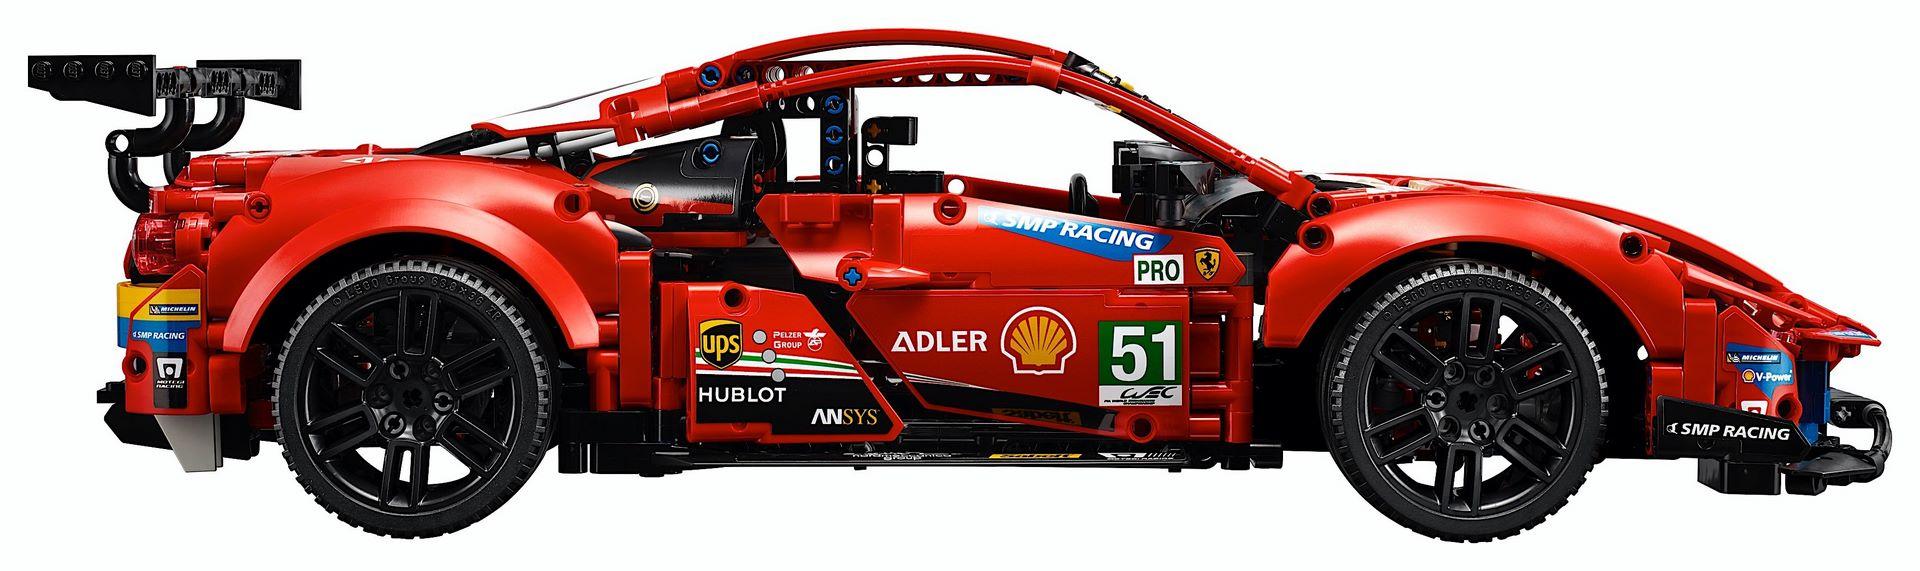 Lego-Technic-Ferrari-488-GTE-AF-Corse-51-14